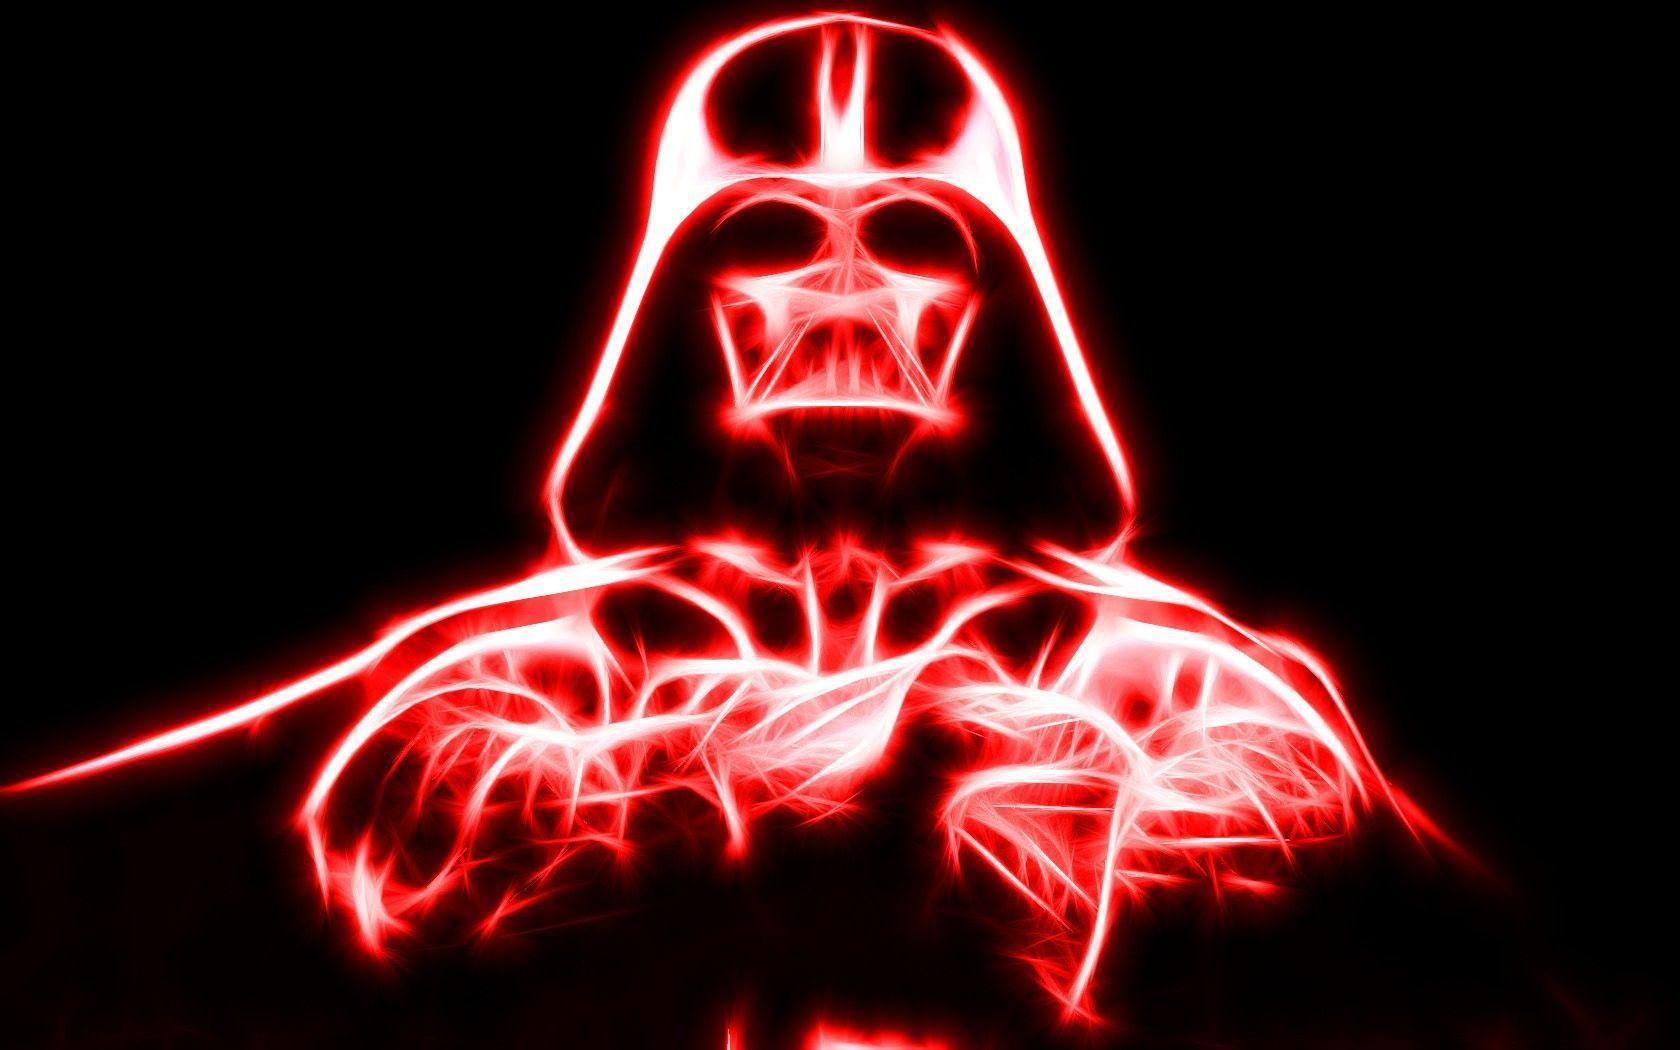 226 2262666 star wars wallpaper neon